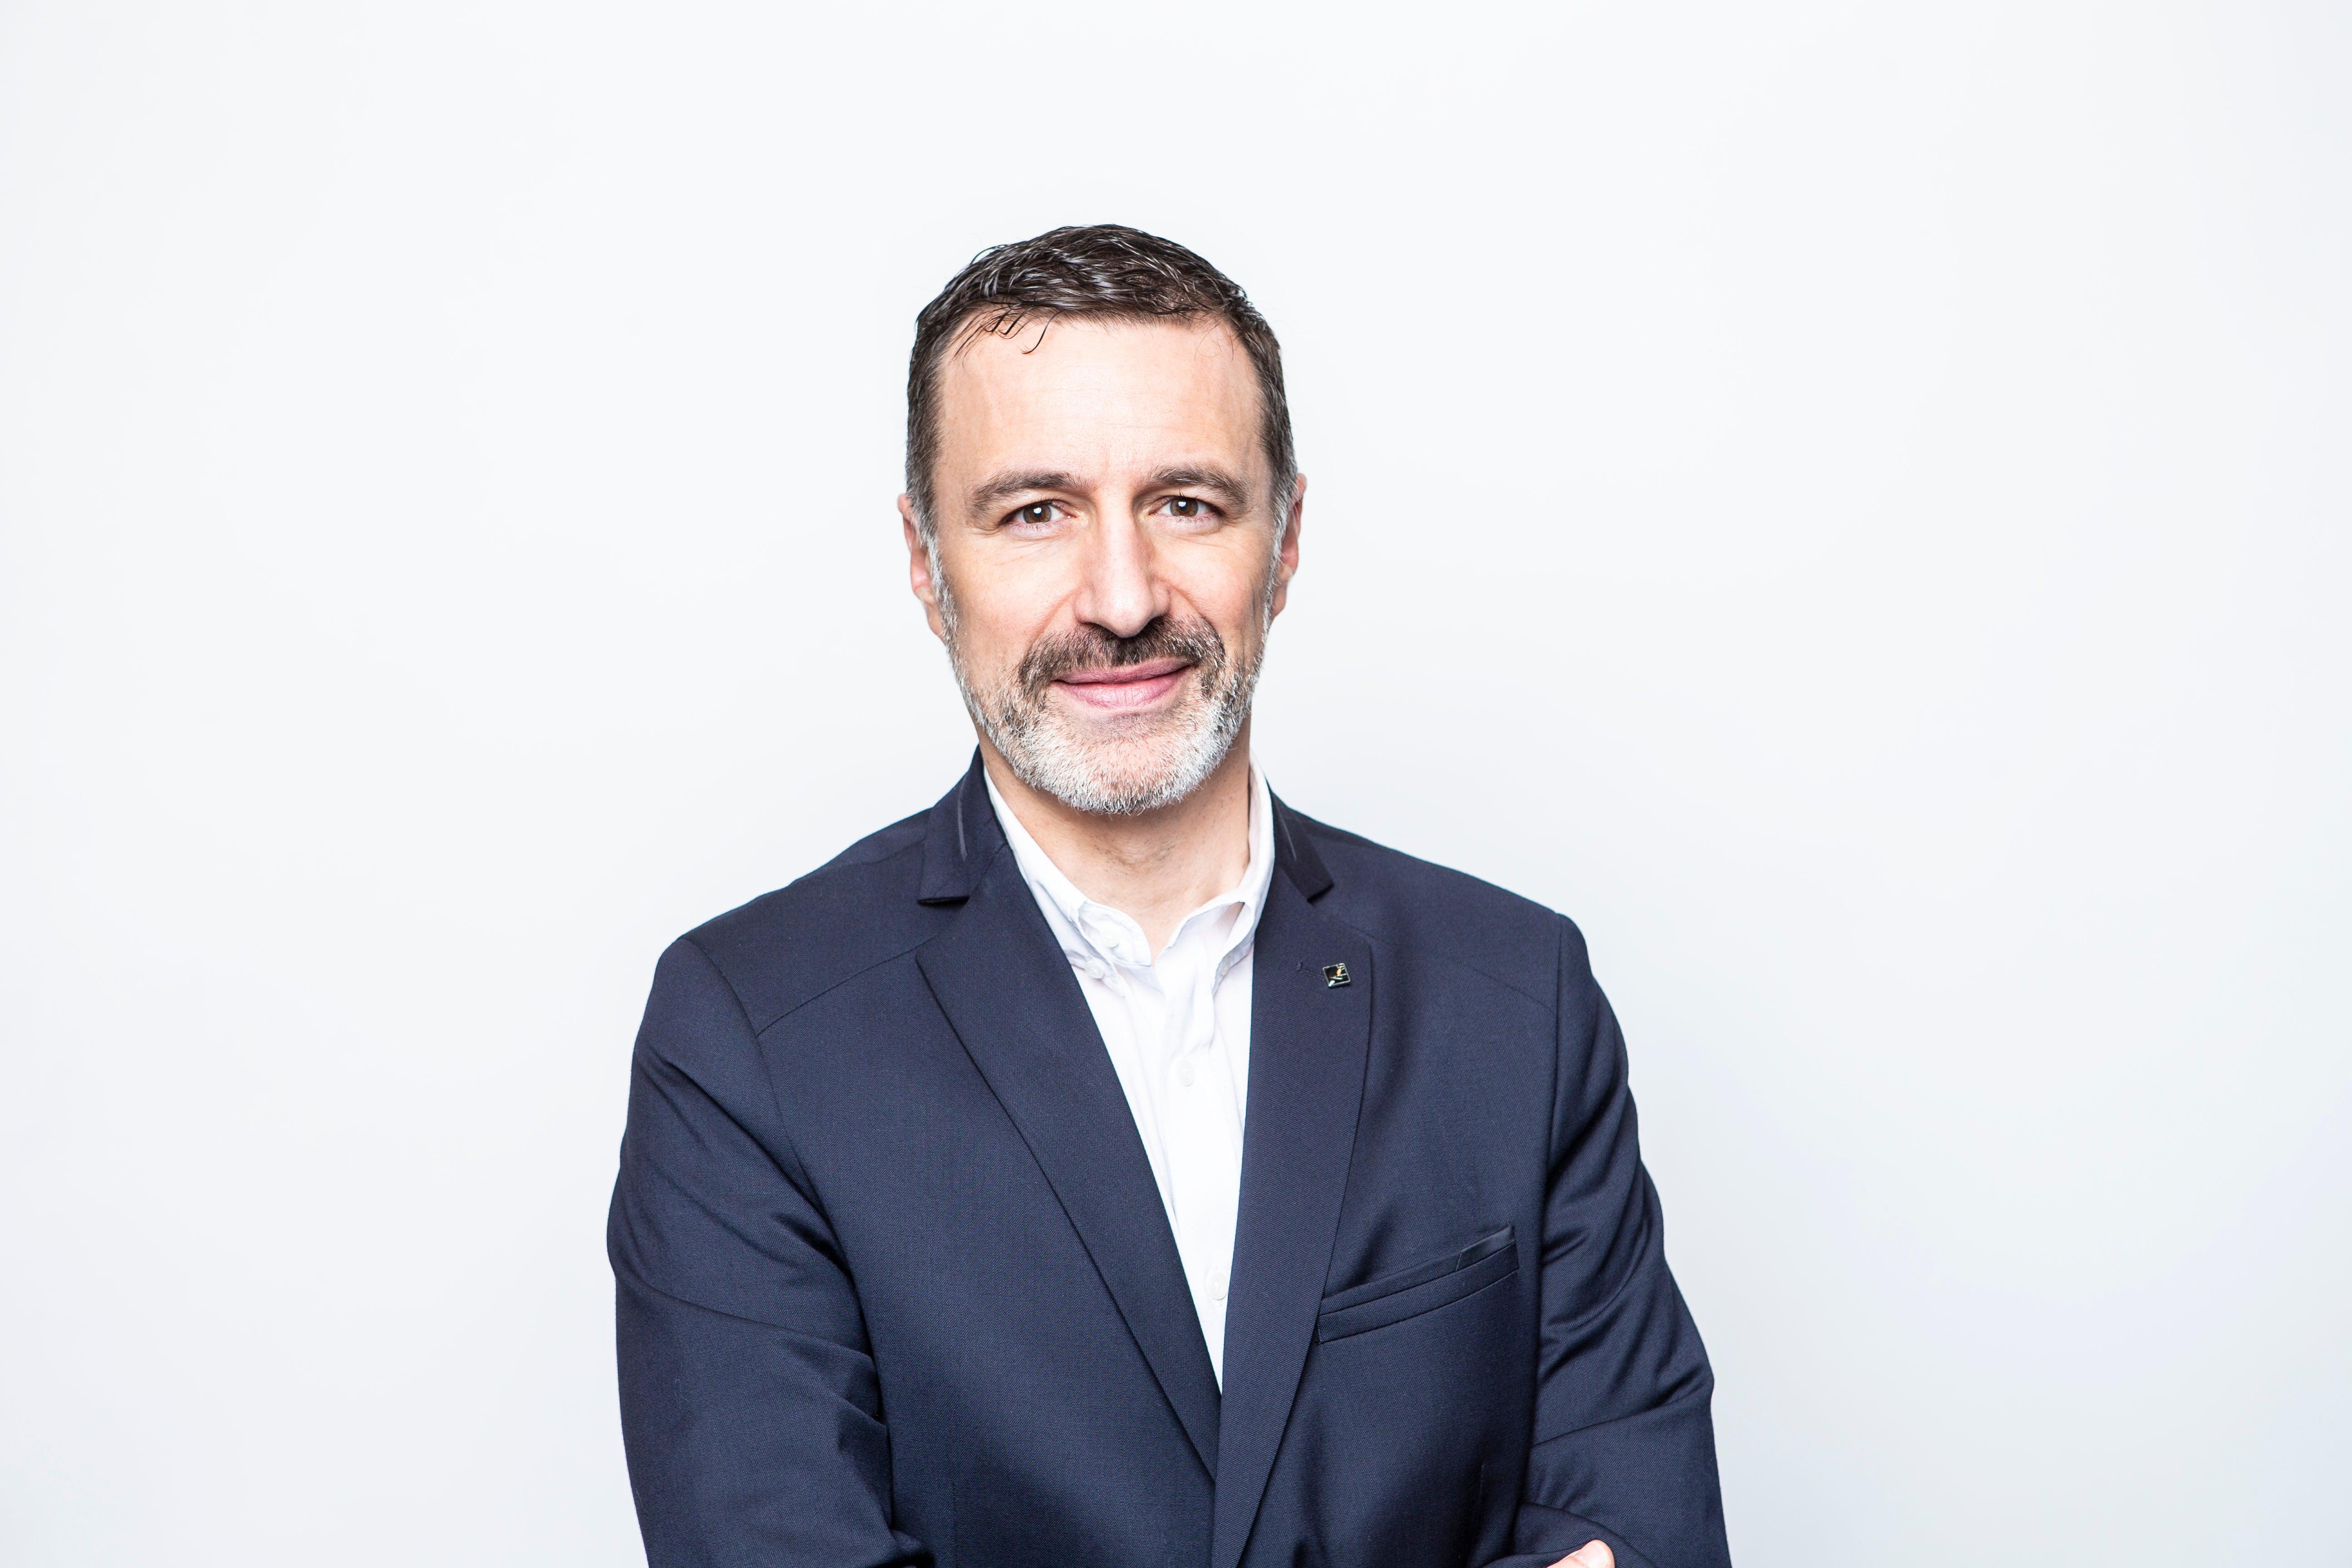 José Fernandez, Chief Commercial Officer & Managing Director iProspect, Dentsu Aegis Network Belgium